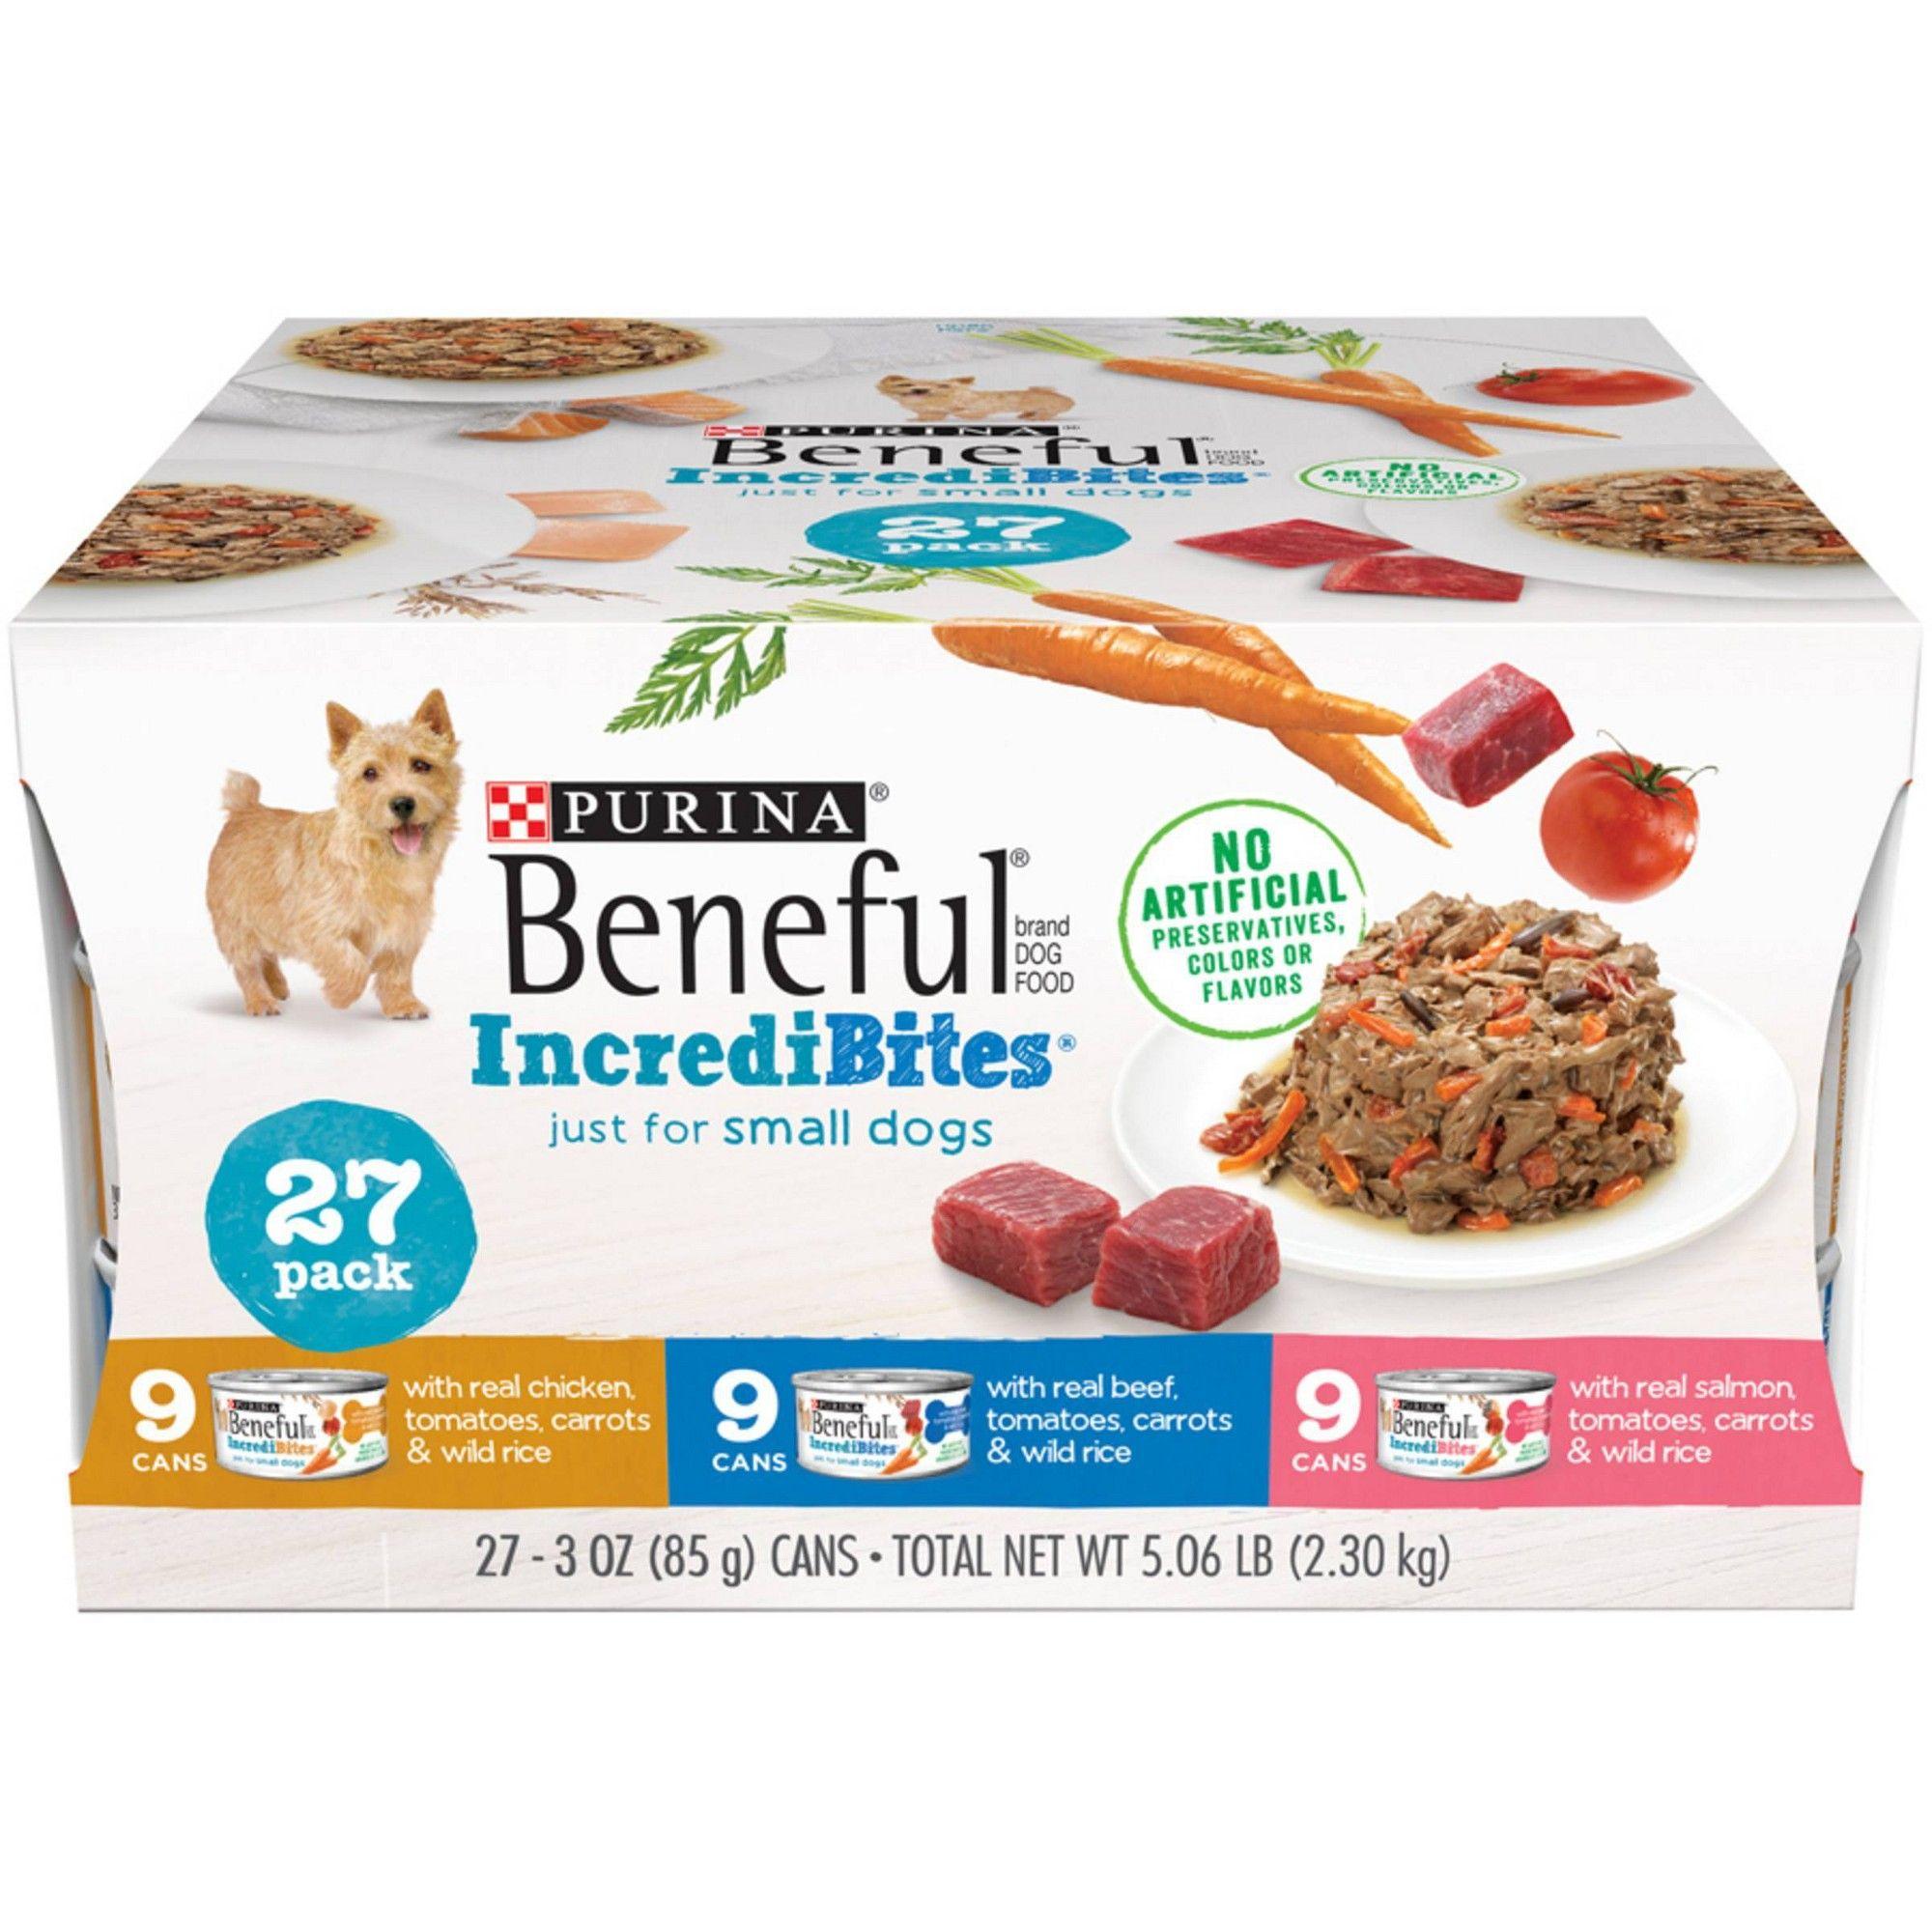 Beneful Incredibites Wet Dog Food Variety Pack 27ct Wet Dog Food